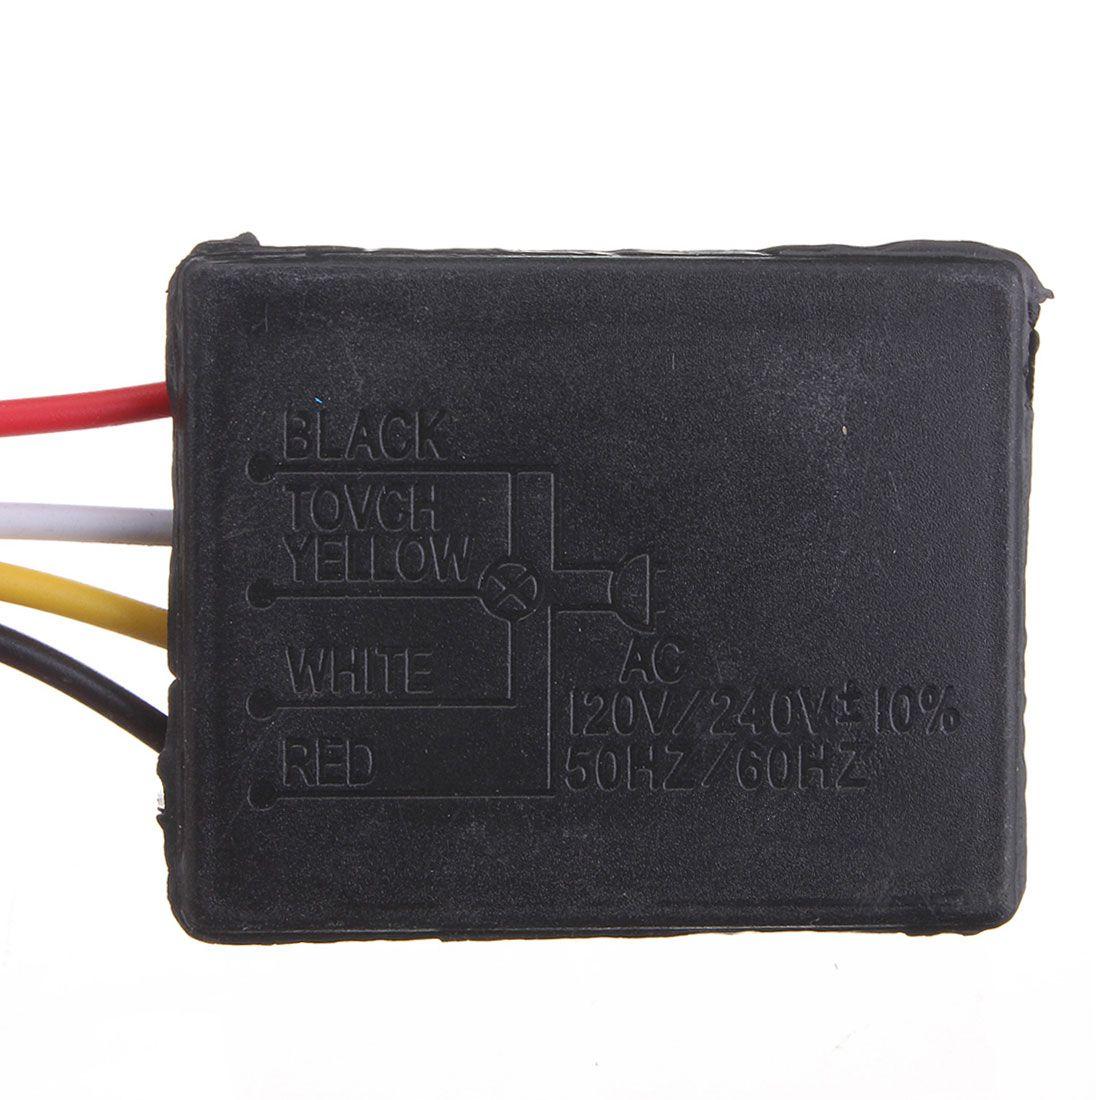 Desk Light Touch Lamp 3 Way Control Sensor Switch Dimmer For Bulbs AC 220V 3A LEG_A0A